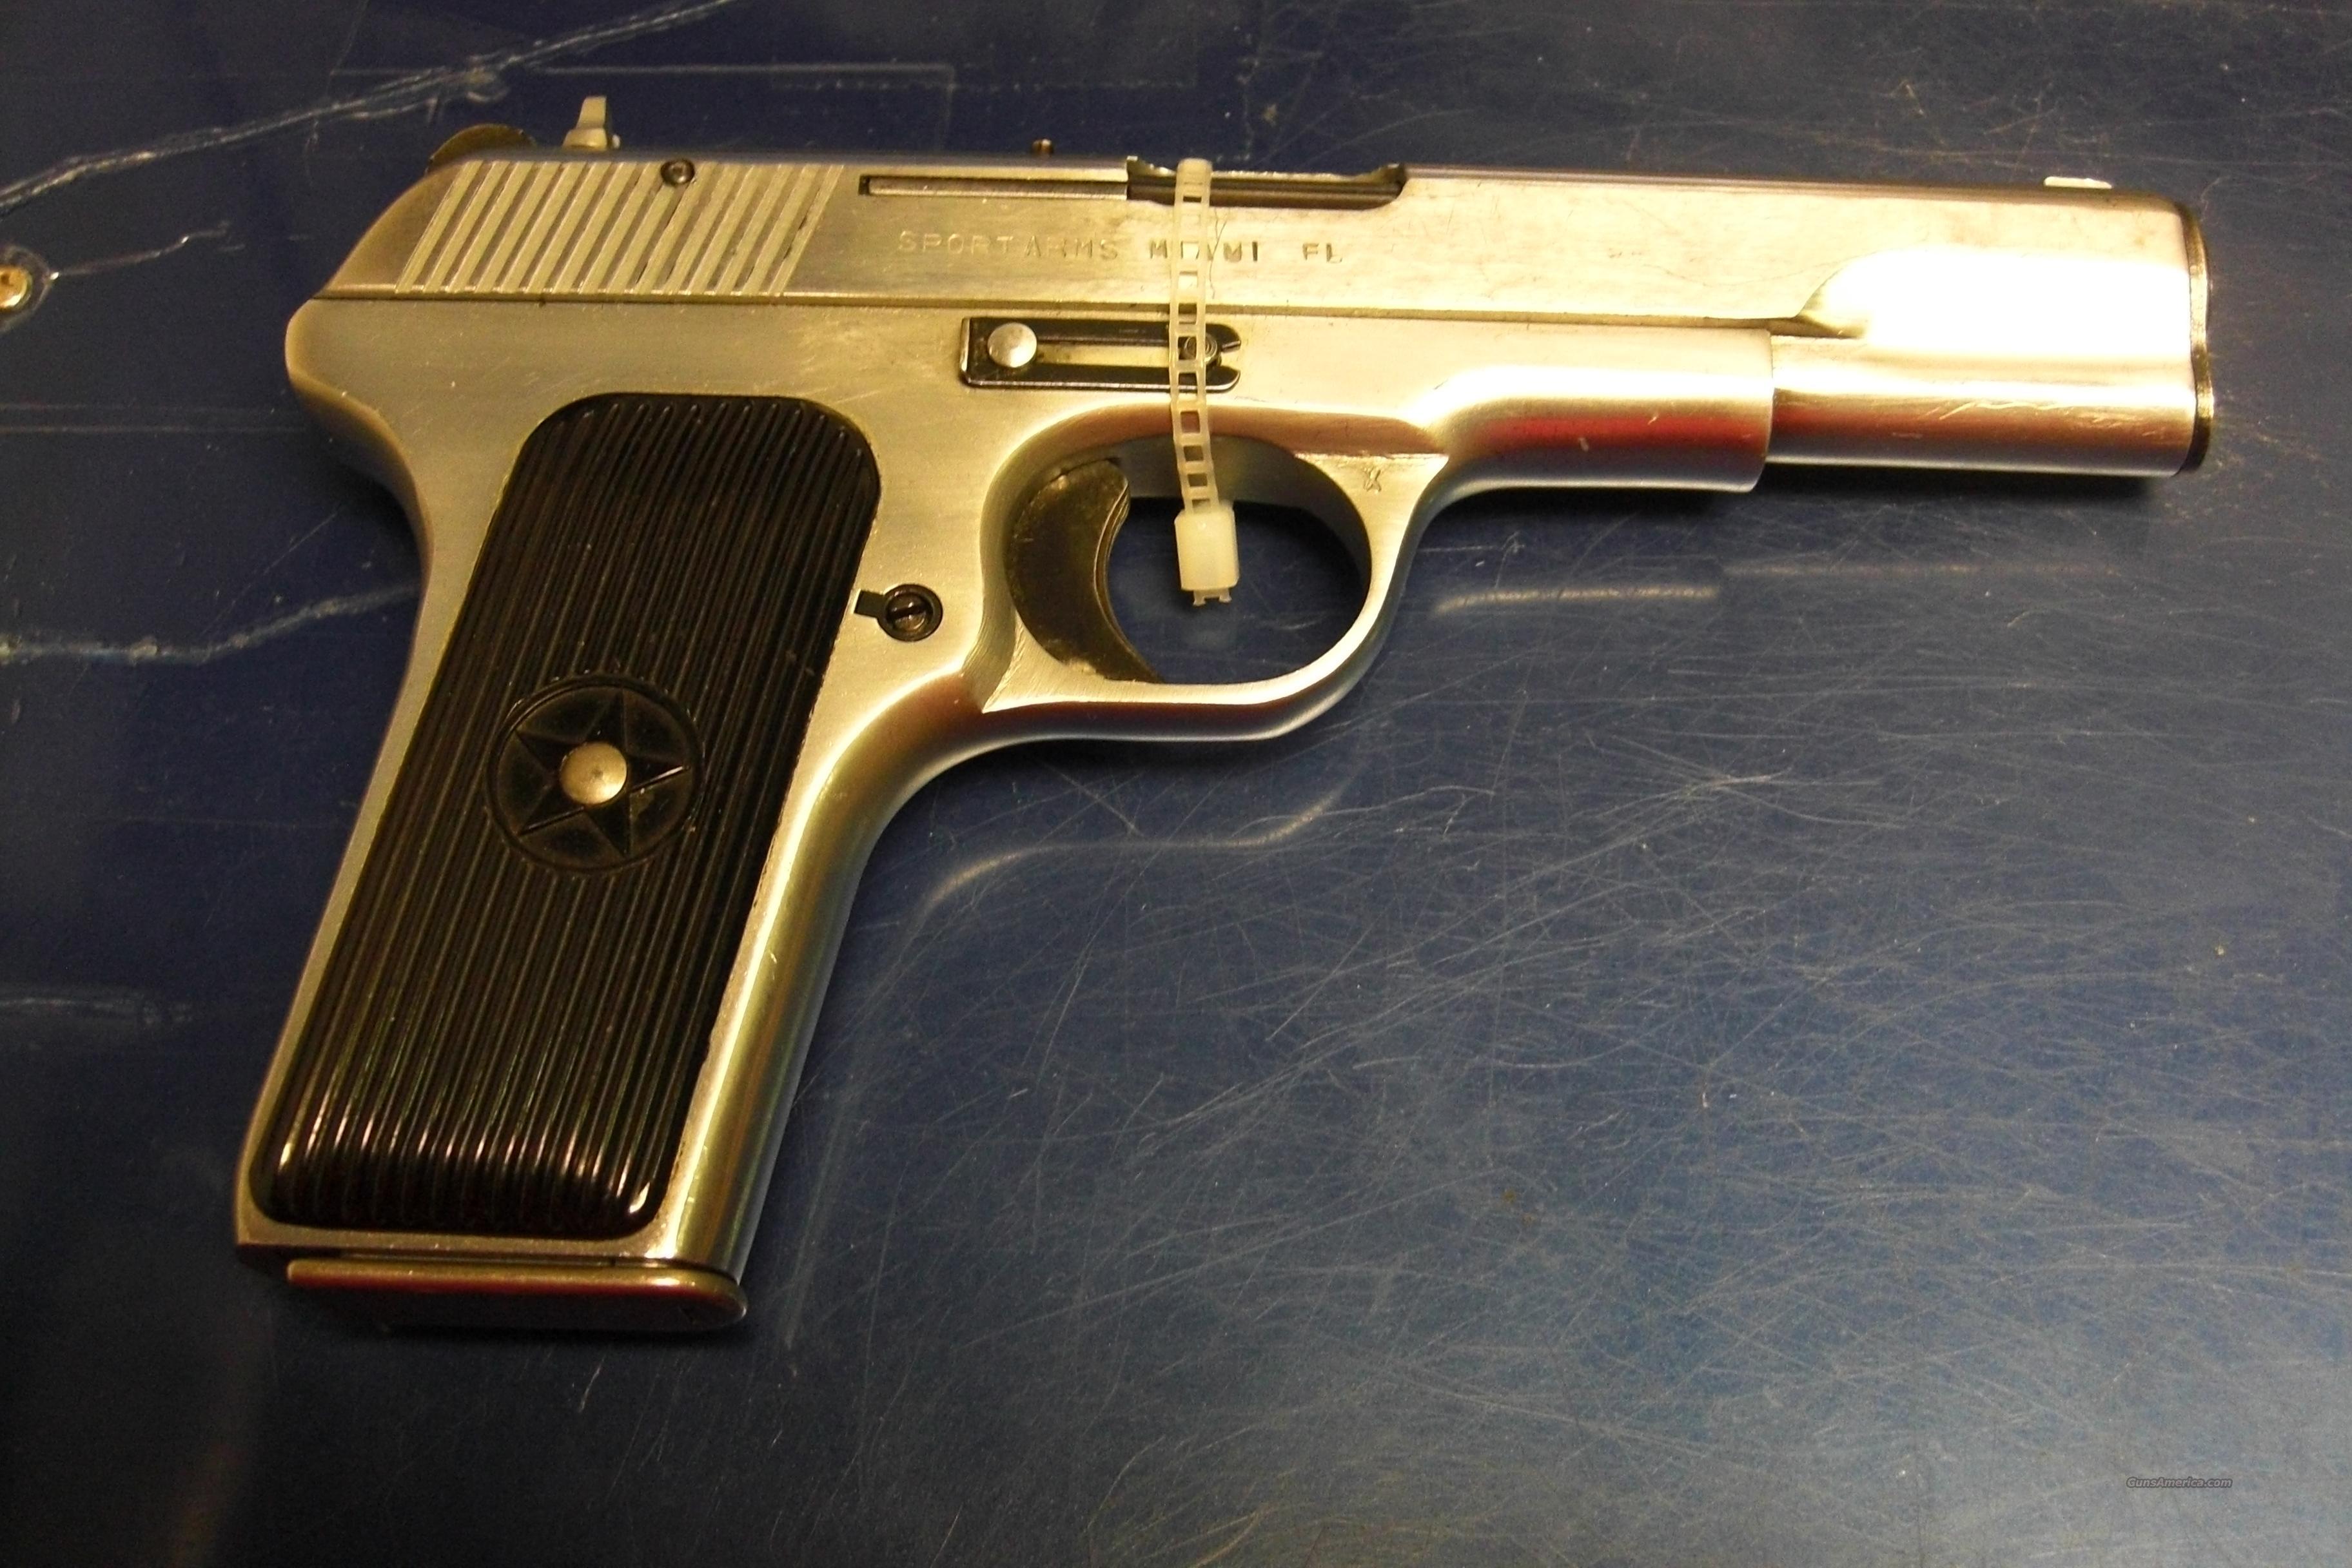 norinco 213 pistol all stainless for sale rh gunsamerica com norinco 213 owners manual 9Mm Norinco 213A